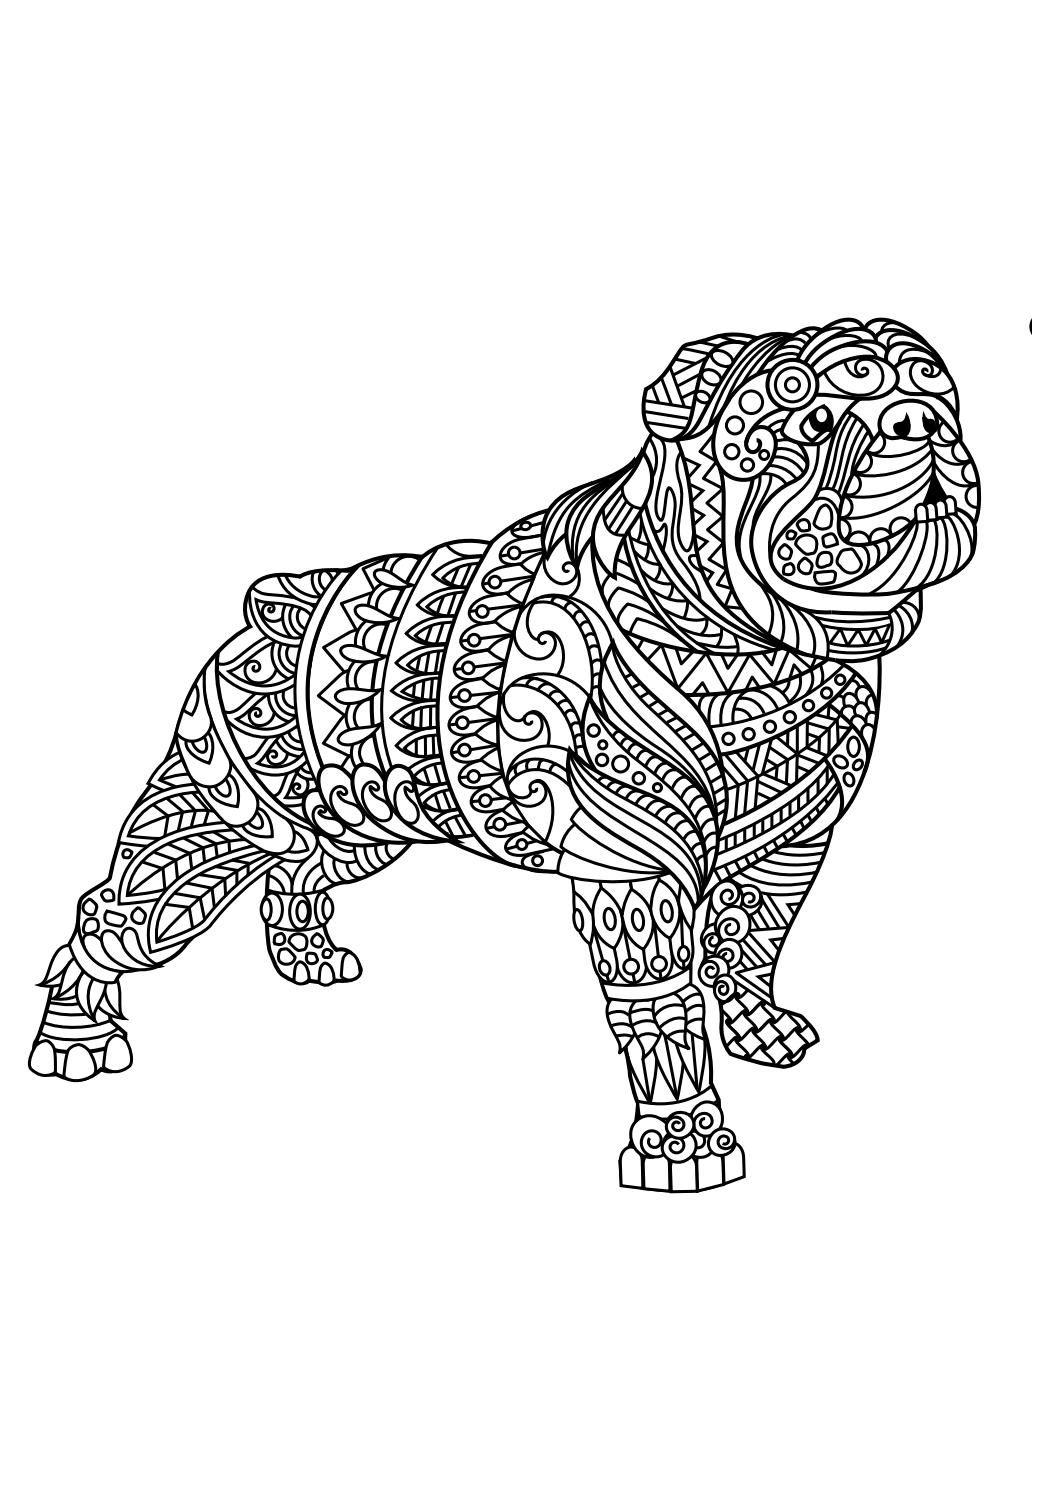 Animal coloring pages pdf mandalas animales pinterest colores